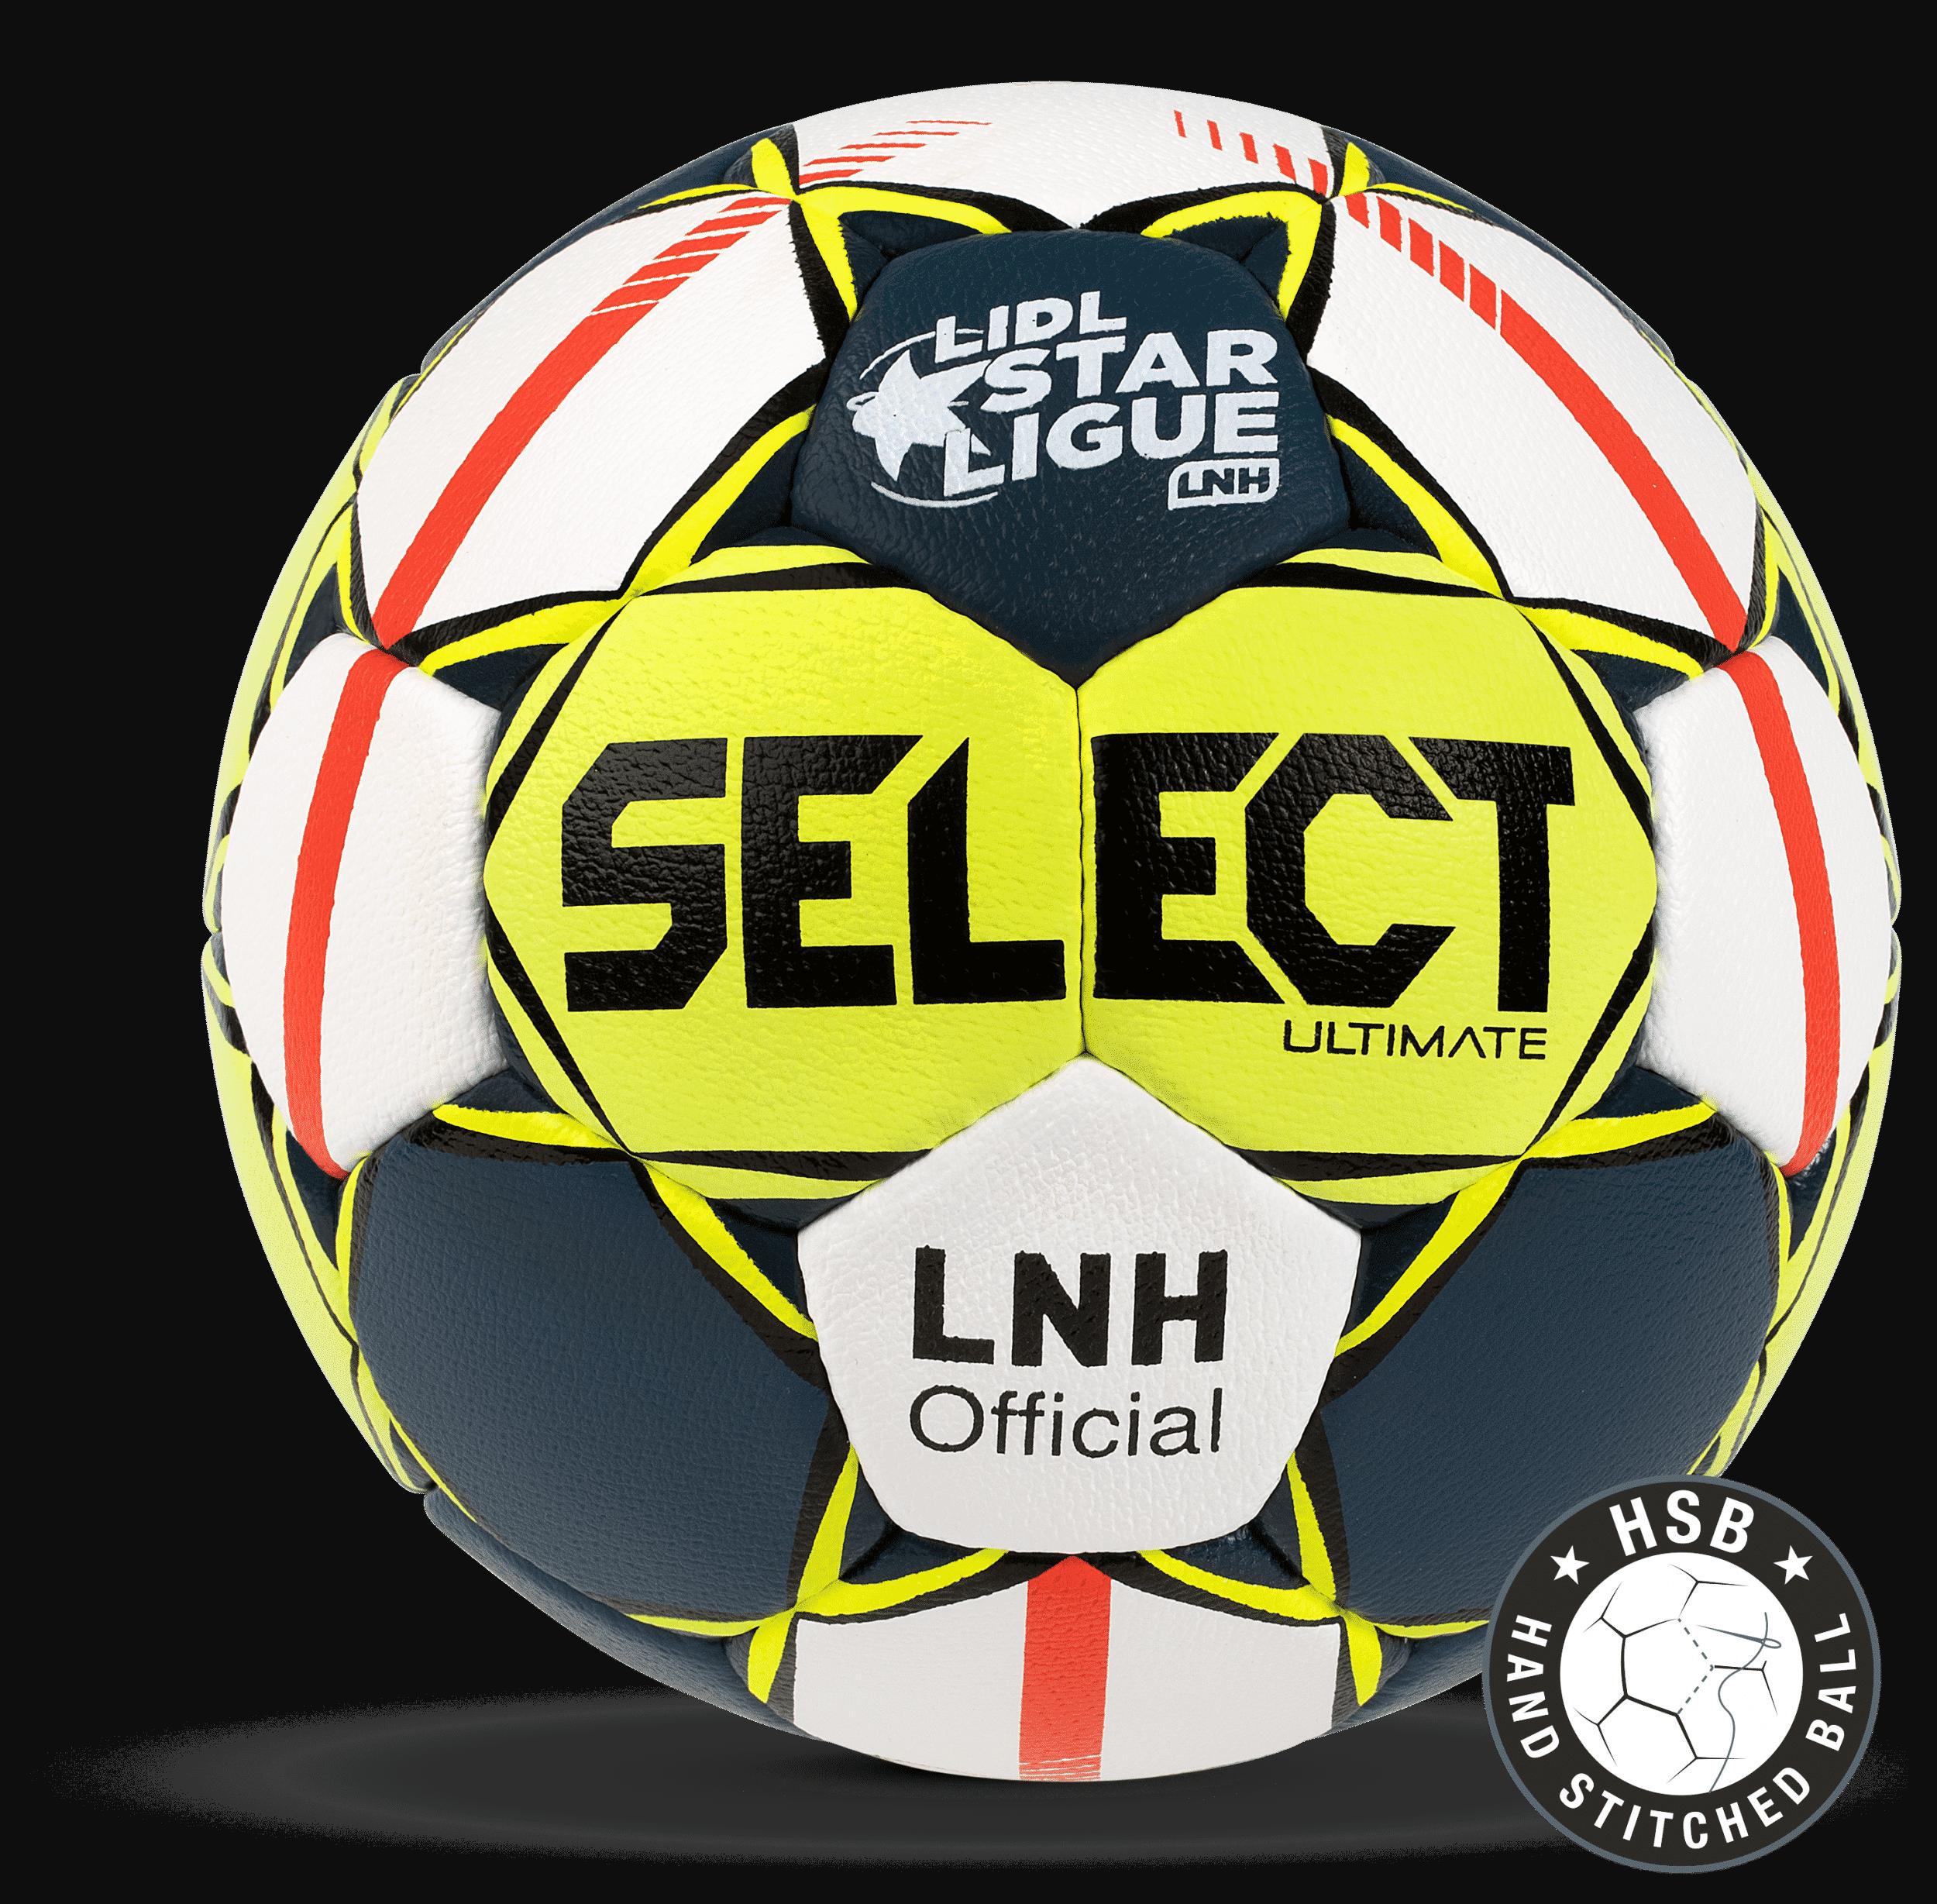 ultimate_handball_lnh_lidl_star_ligue_france_2019